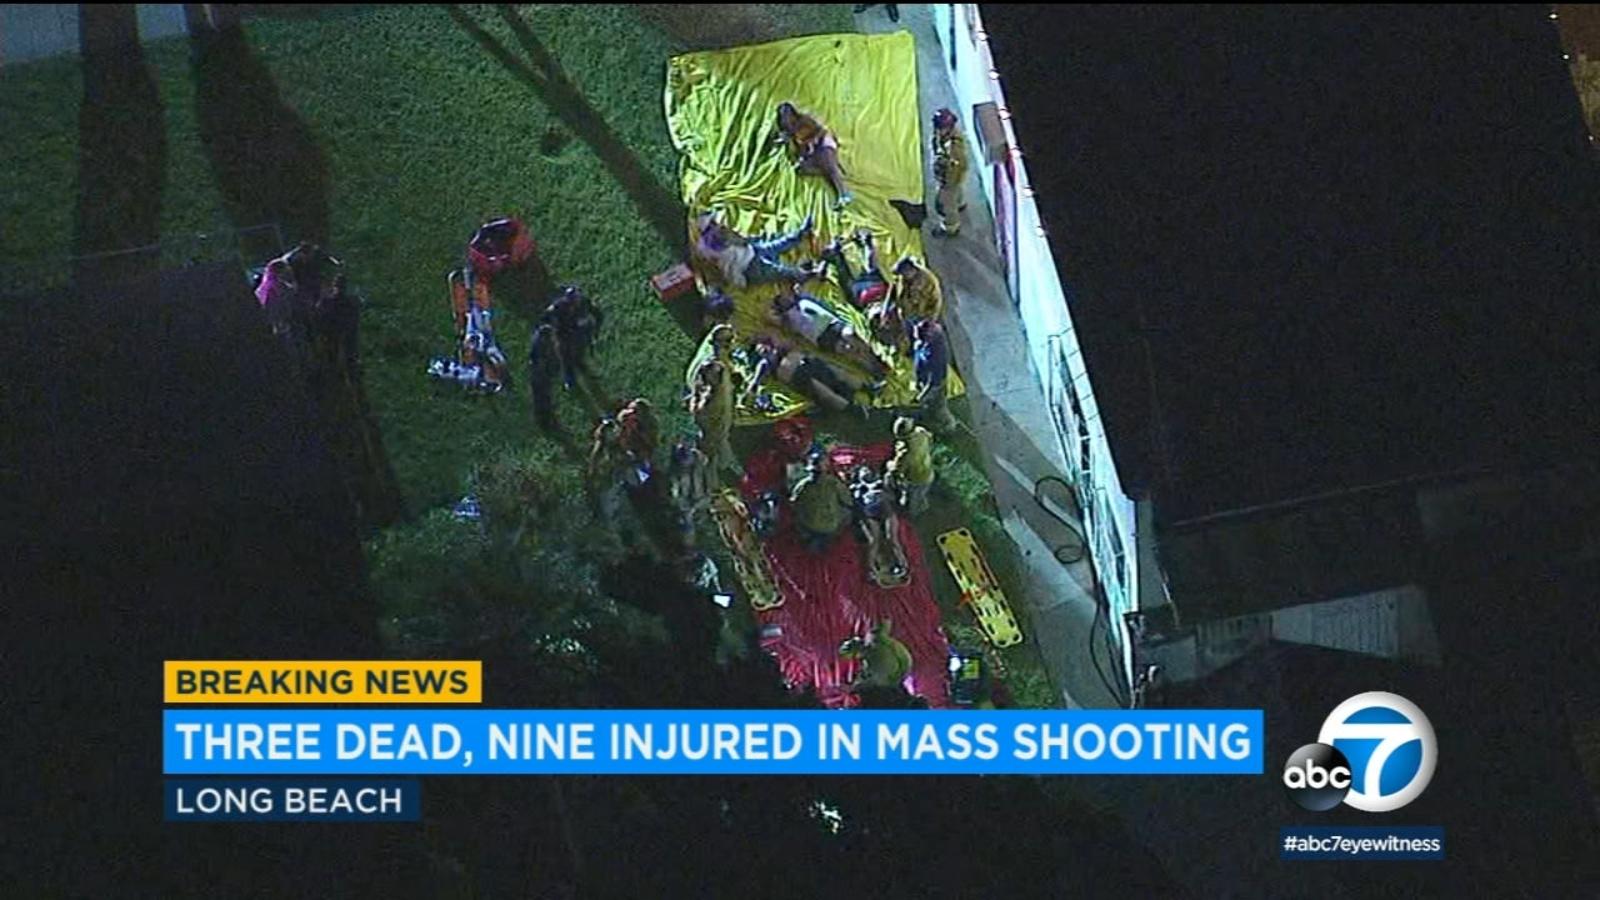 Long Beach mass shooting: 3 dead, 9 injured after gunfire erupts at party - KABC-TV